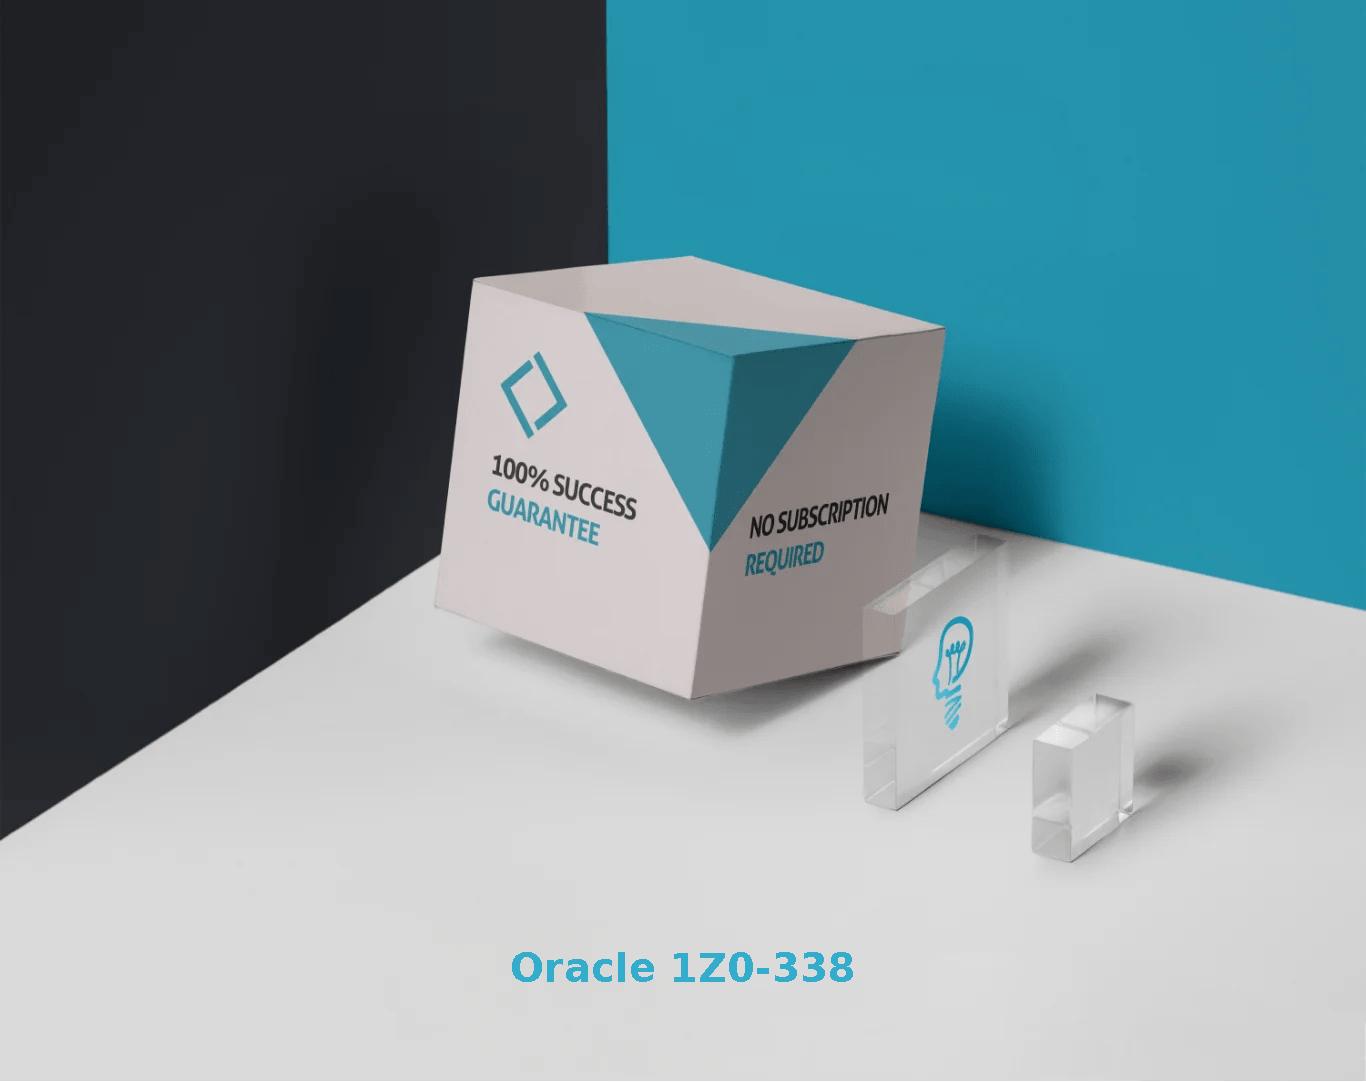 Oracle 1Z0-338 Exams